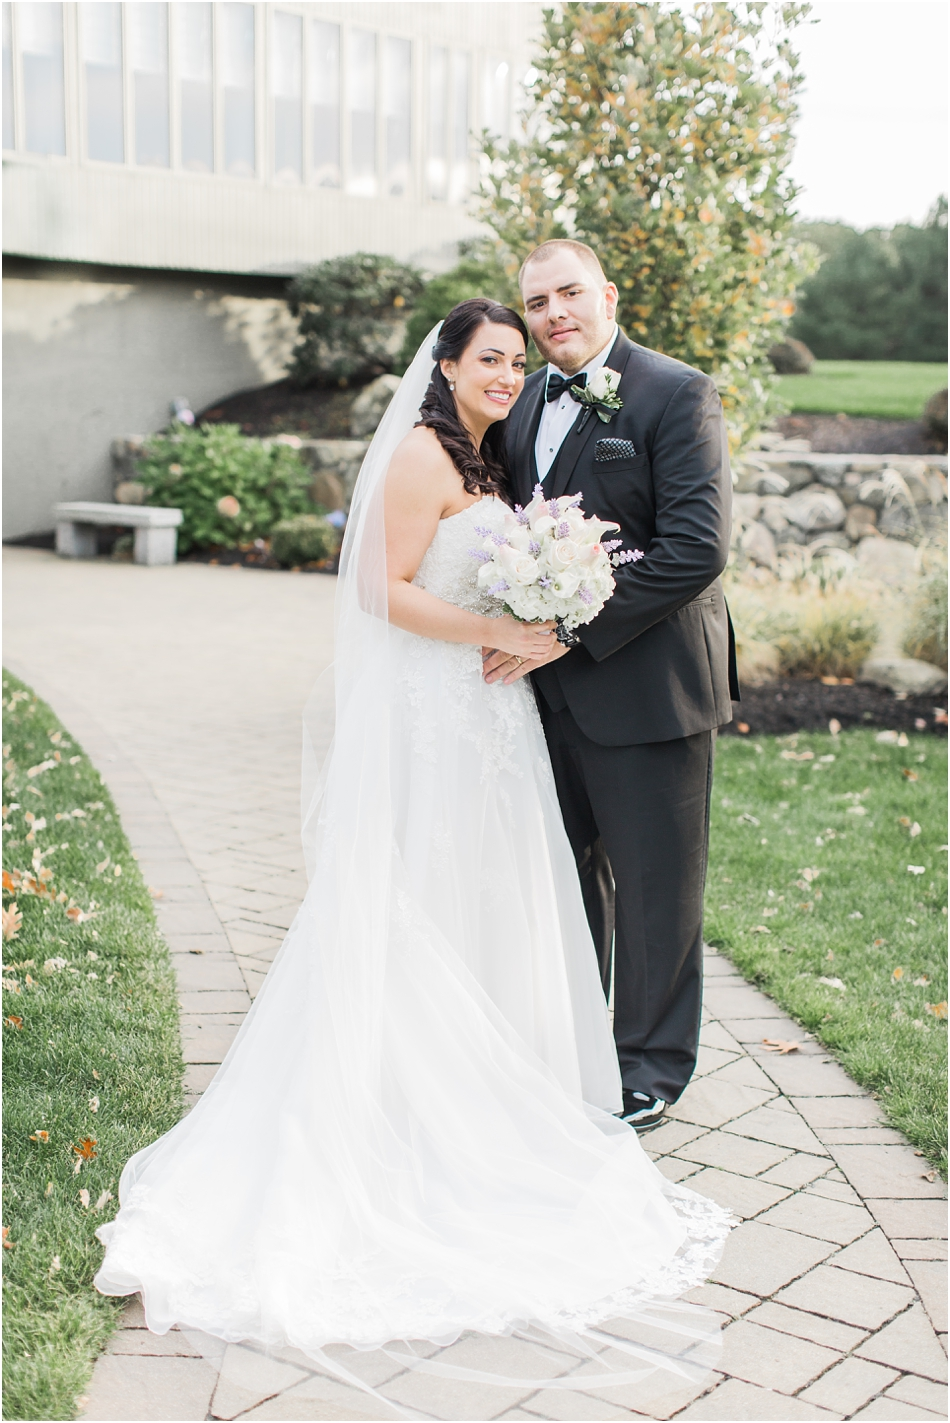 north_reading_lauren_sal_ballroom_cape_cod_boston_new_england_wedding_photographer_Meredith_Jane_Photography_photo_0122.jpg